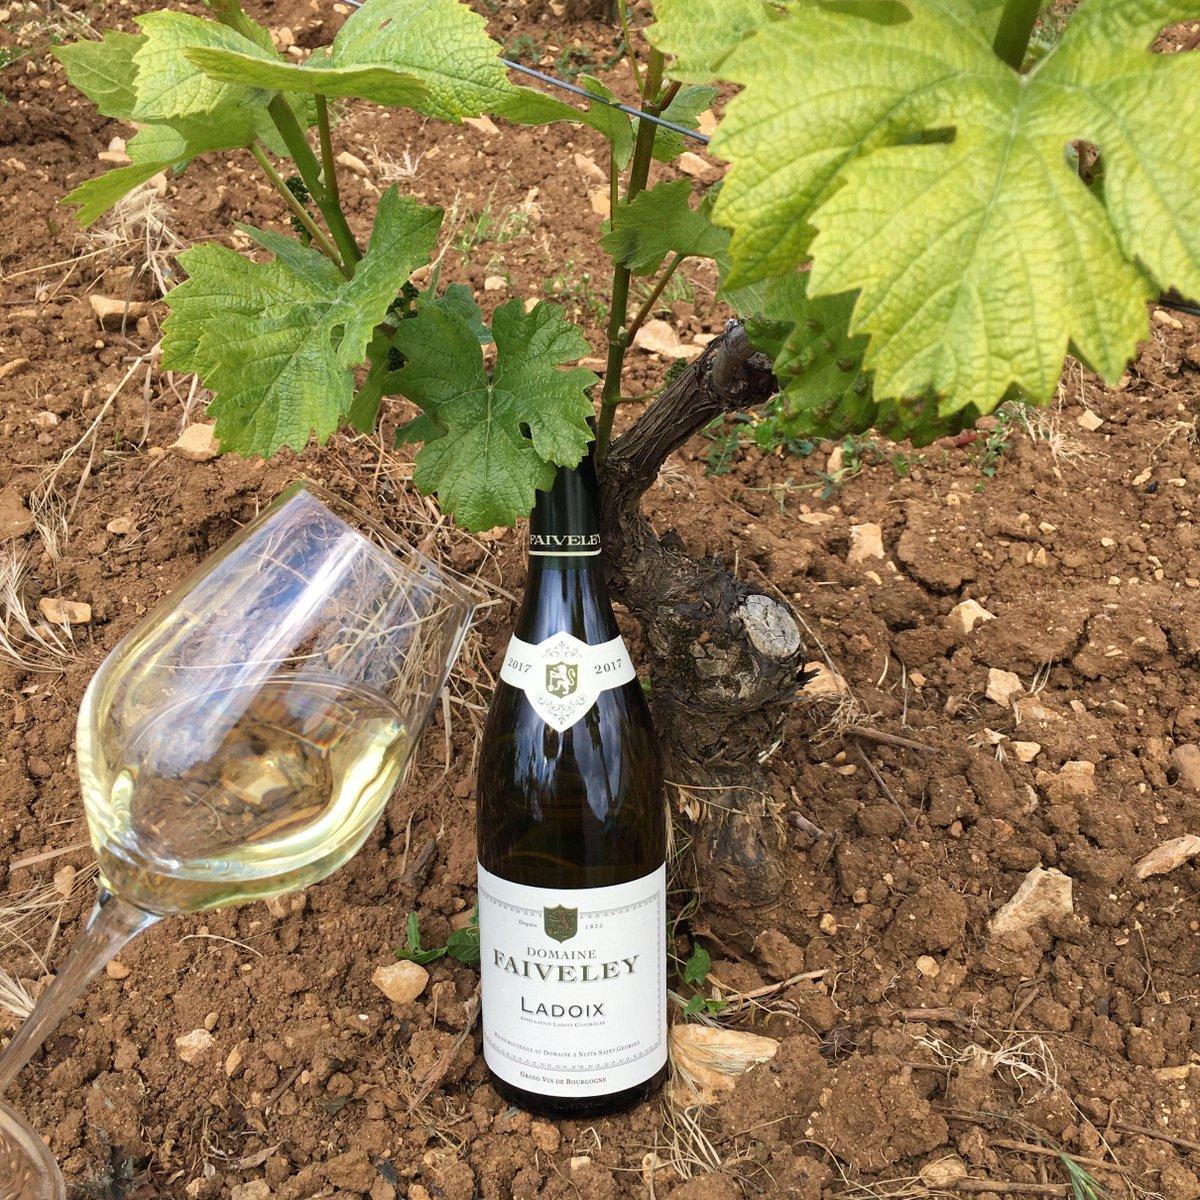 """Chardonnay Day = Funday !""  #Bourgogne #ChardonnayDay #vinblanc #winelover #dégustation #tasting #whitewine #ladoixblanc #cheers #happyday #àvotresantépic.twitter.com/oOlwAOvCal"